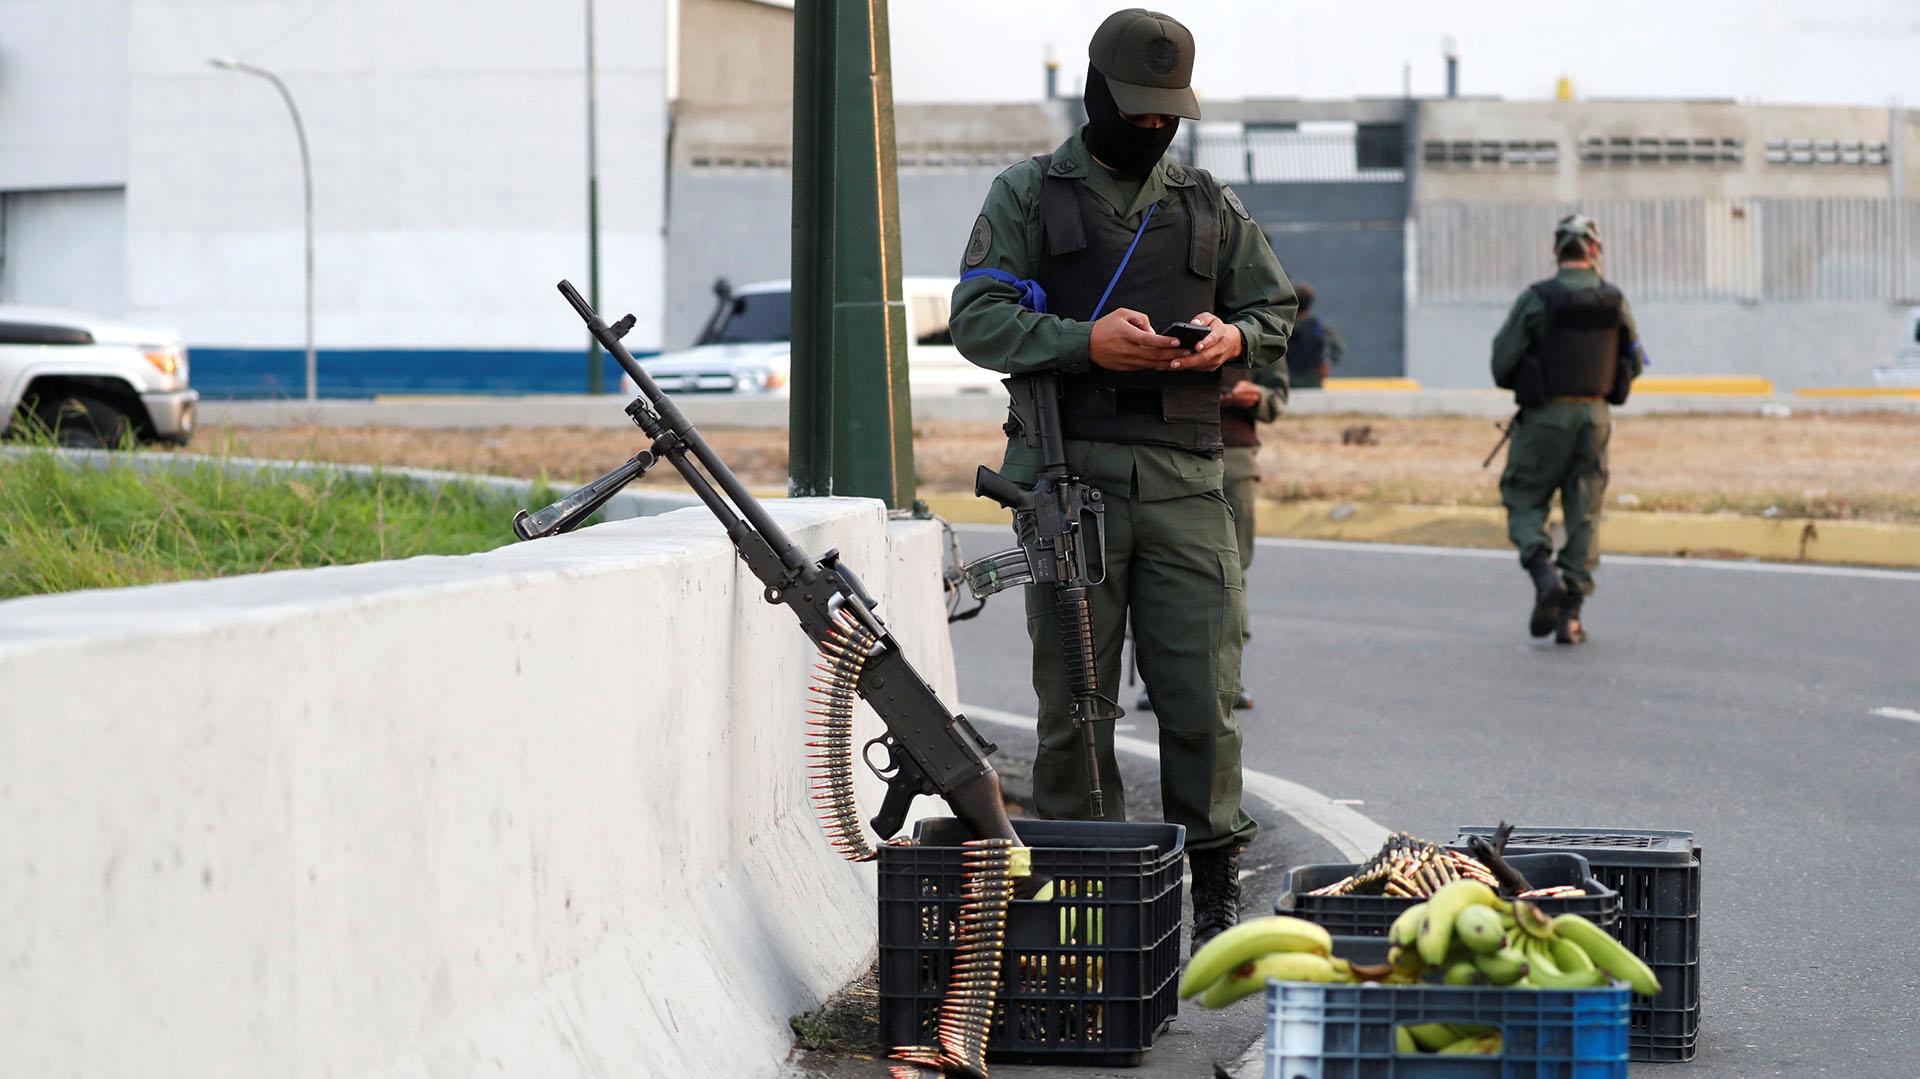 A military member uses his phone near the Generalisimo Francisco de Miranda Airbase in Caracas